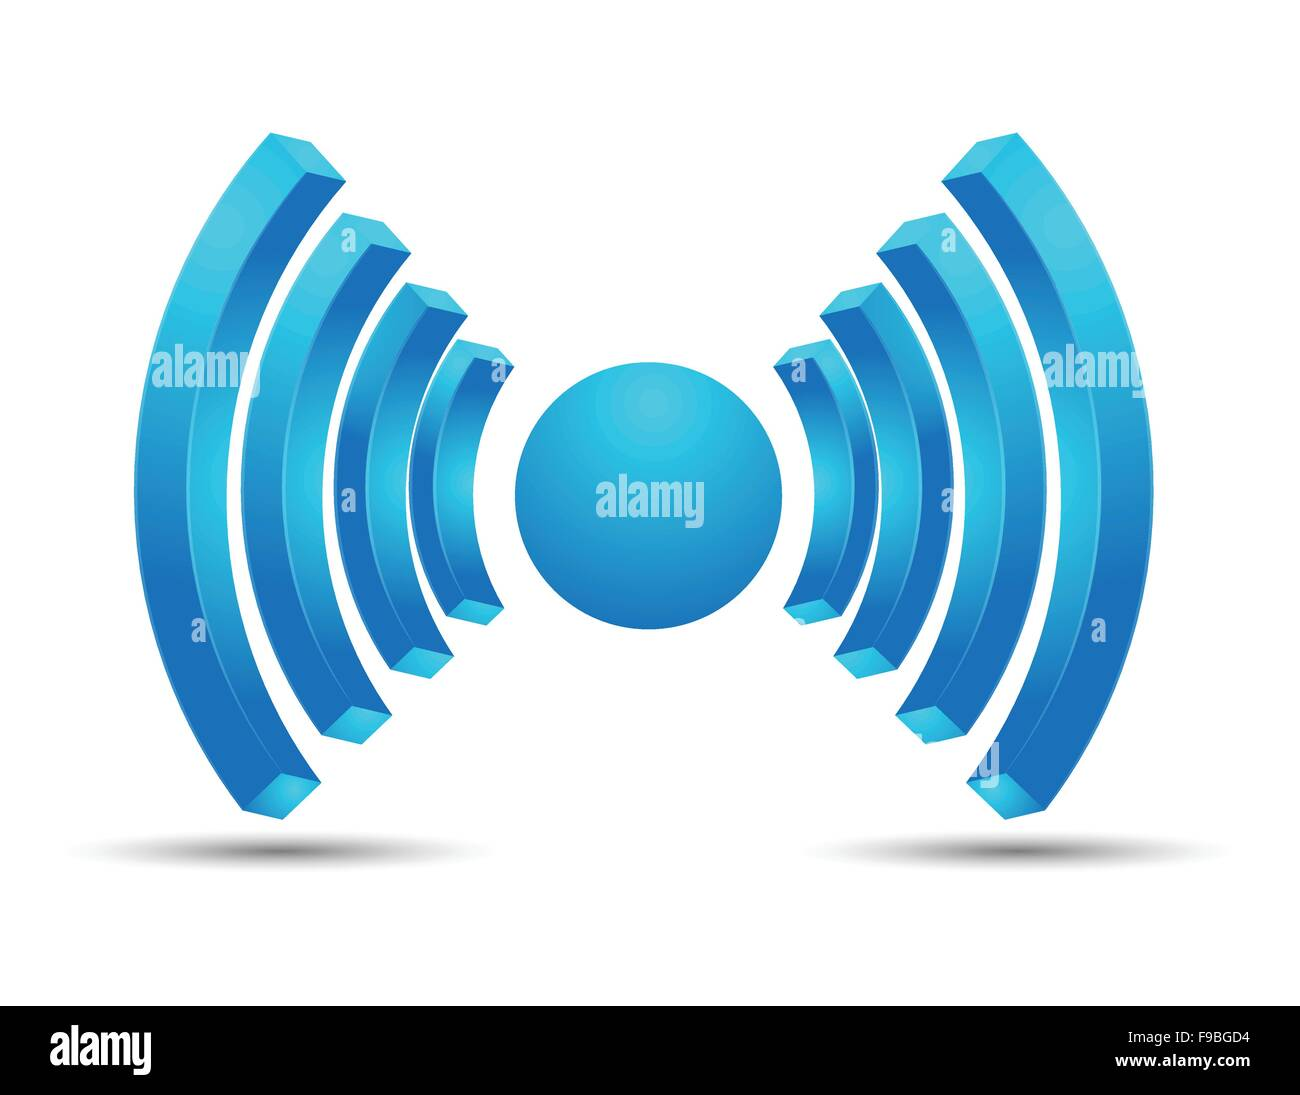 Wifi hotspot icon vector design blue color - Stock Image